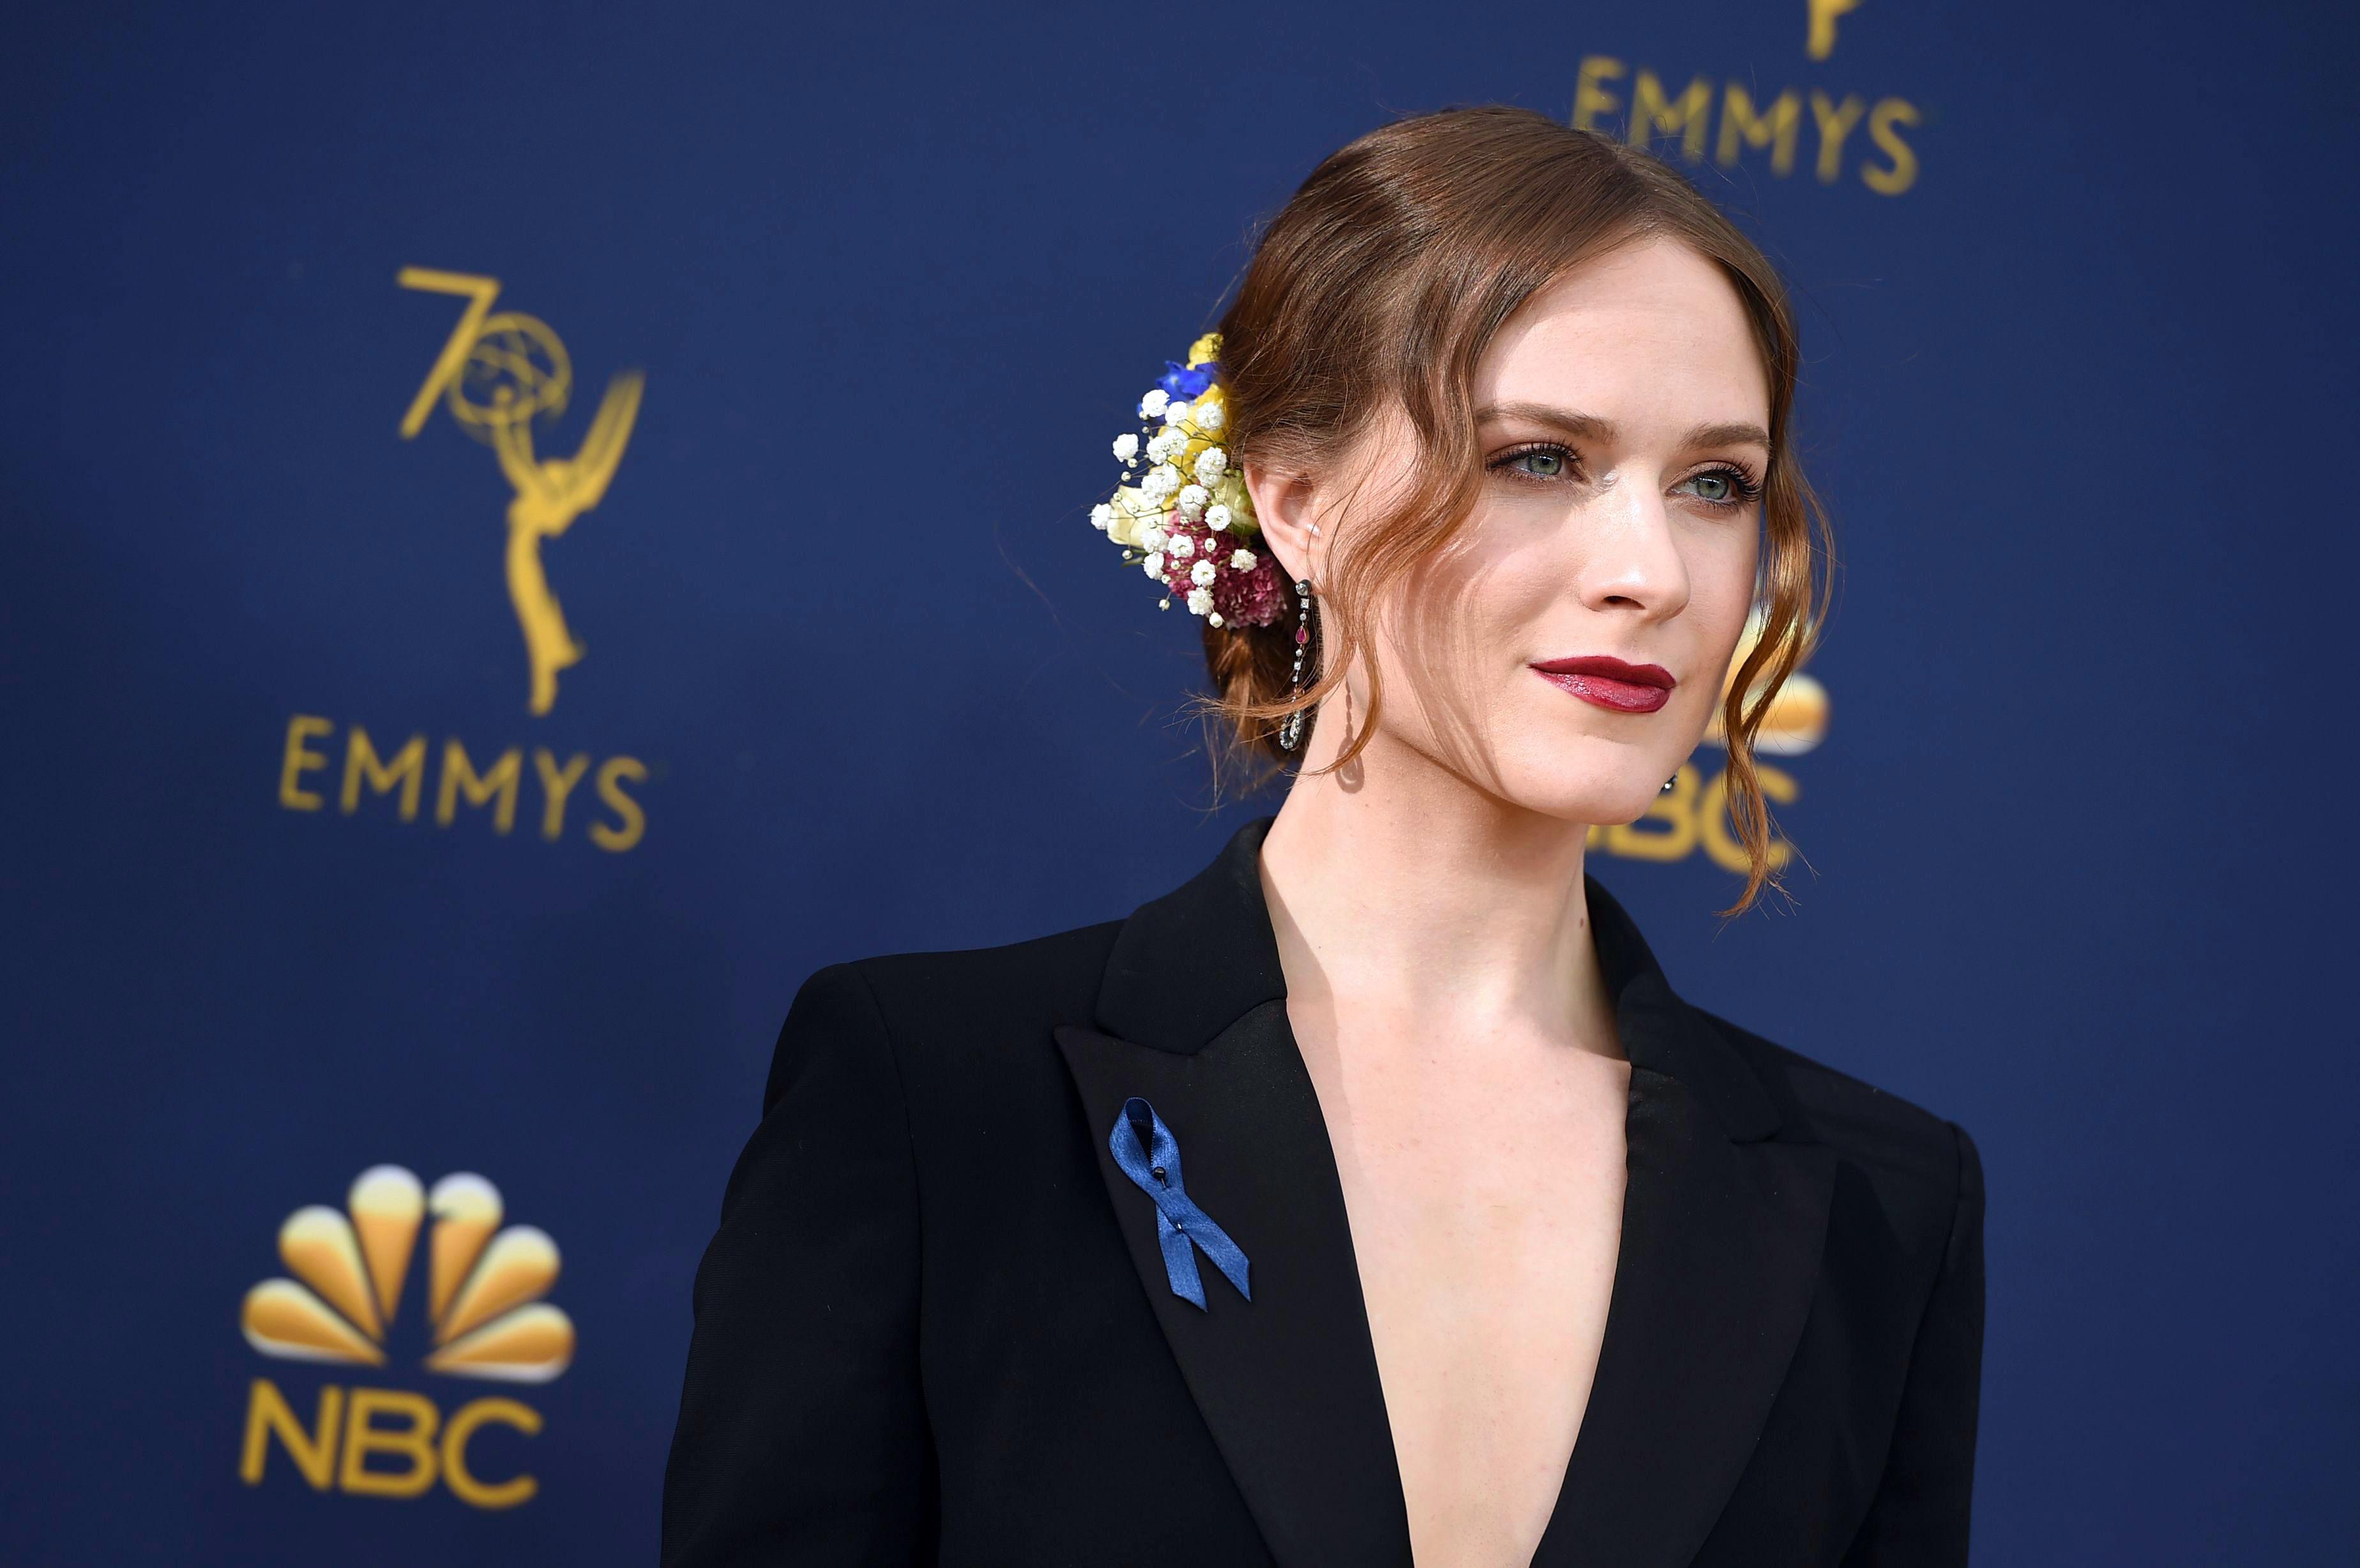 Evan Rachel Wood2018 Primetime Emmy Awards - Arrivals, Los Angeles, USA - 17 Sep 2018